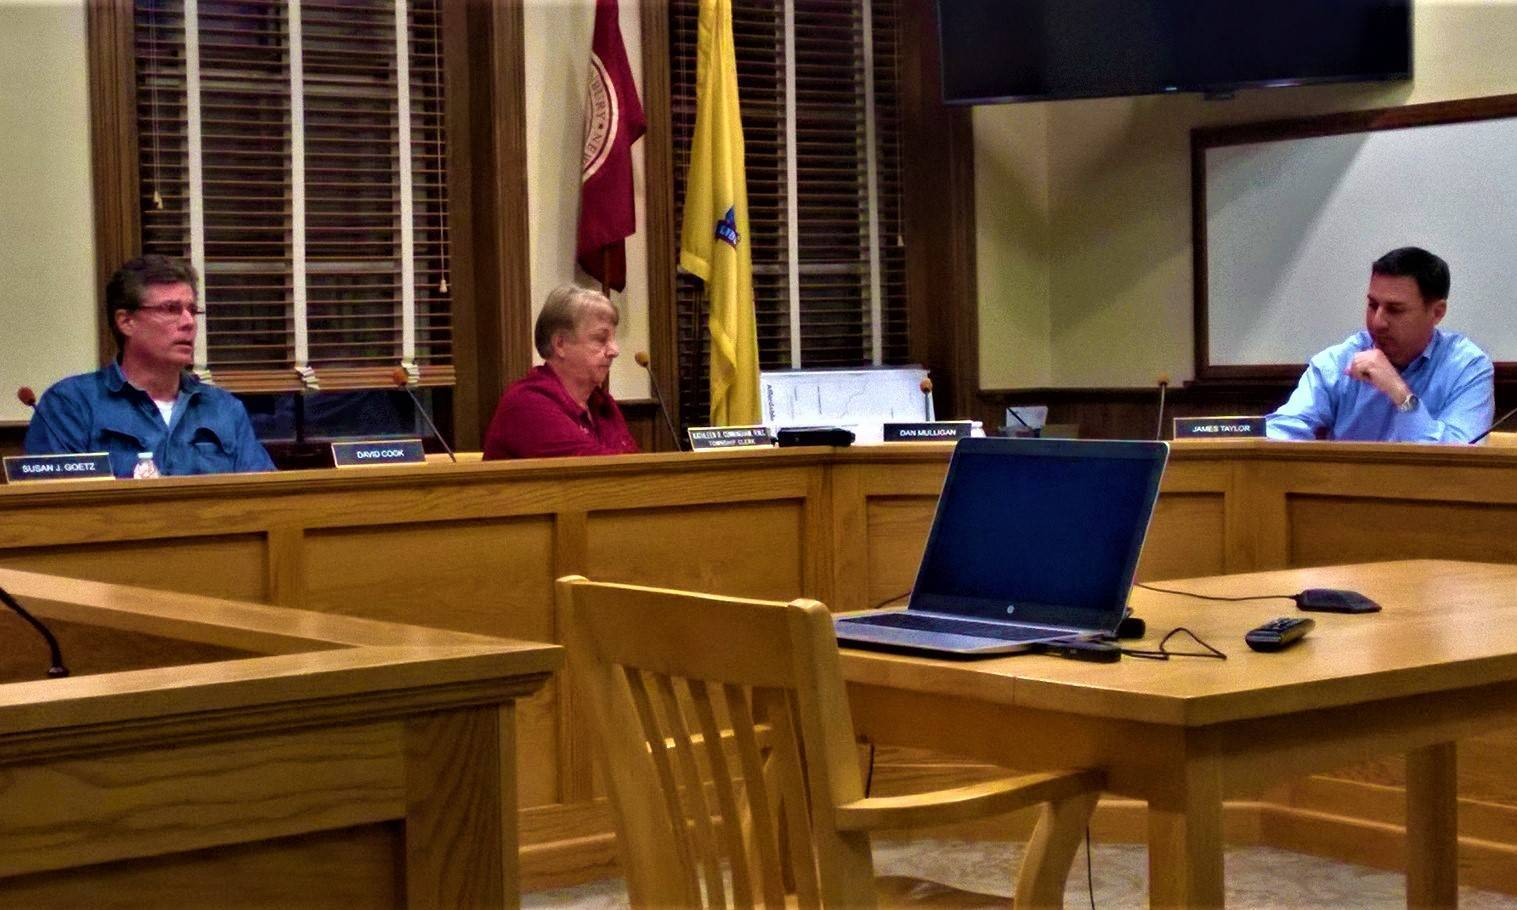 Cranbury Township Committee Approves 11 4 Million Budget South Brunswick Cranbury Nj News